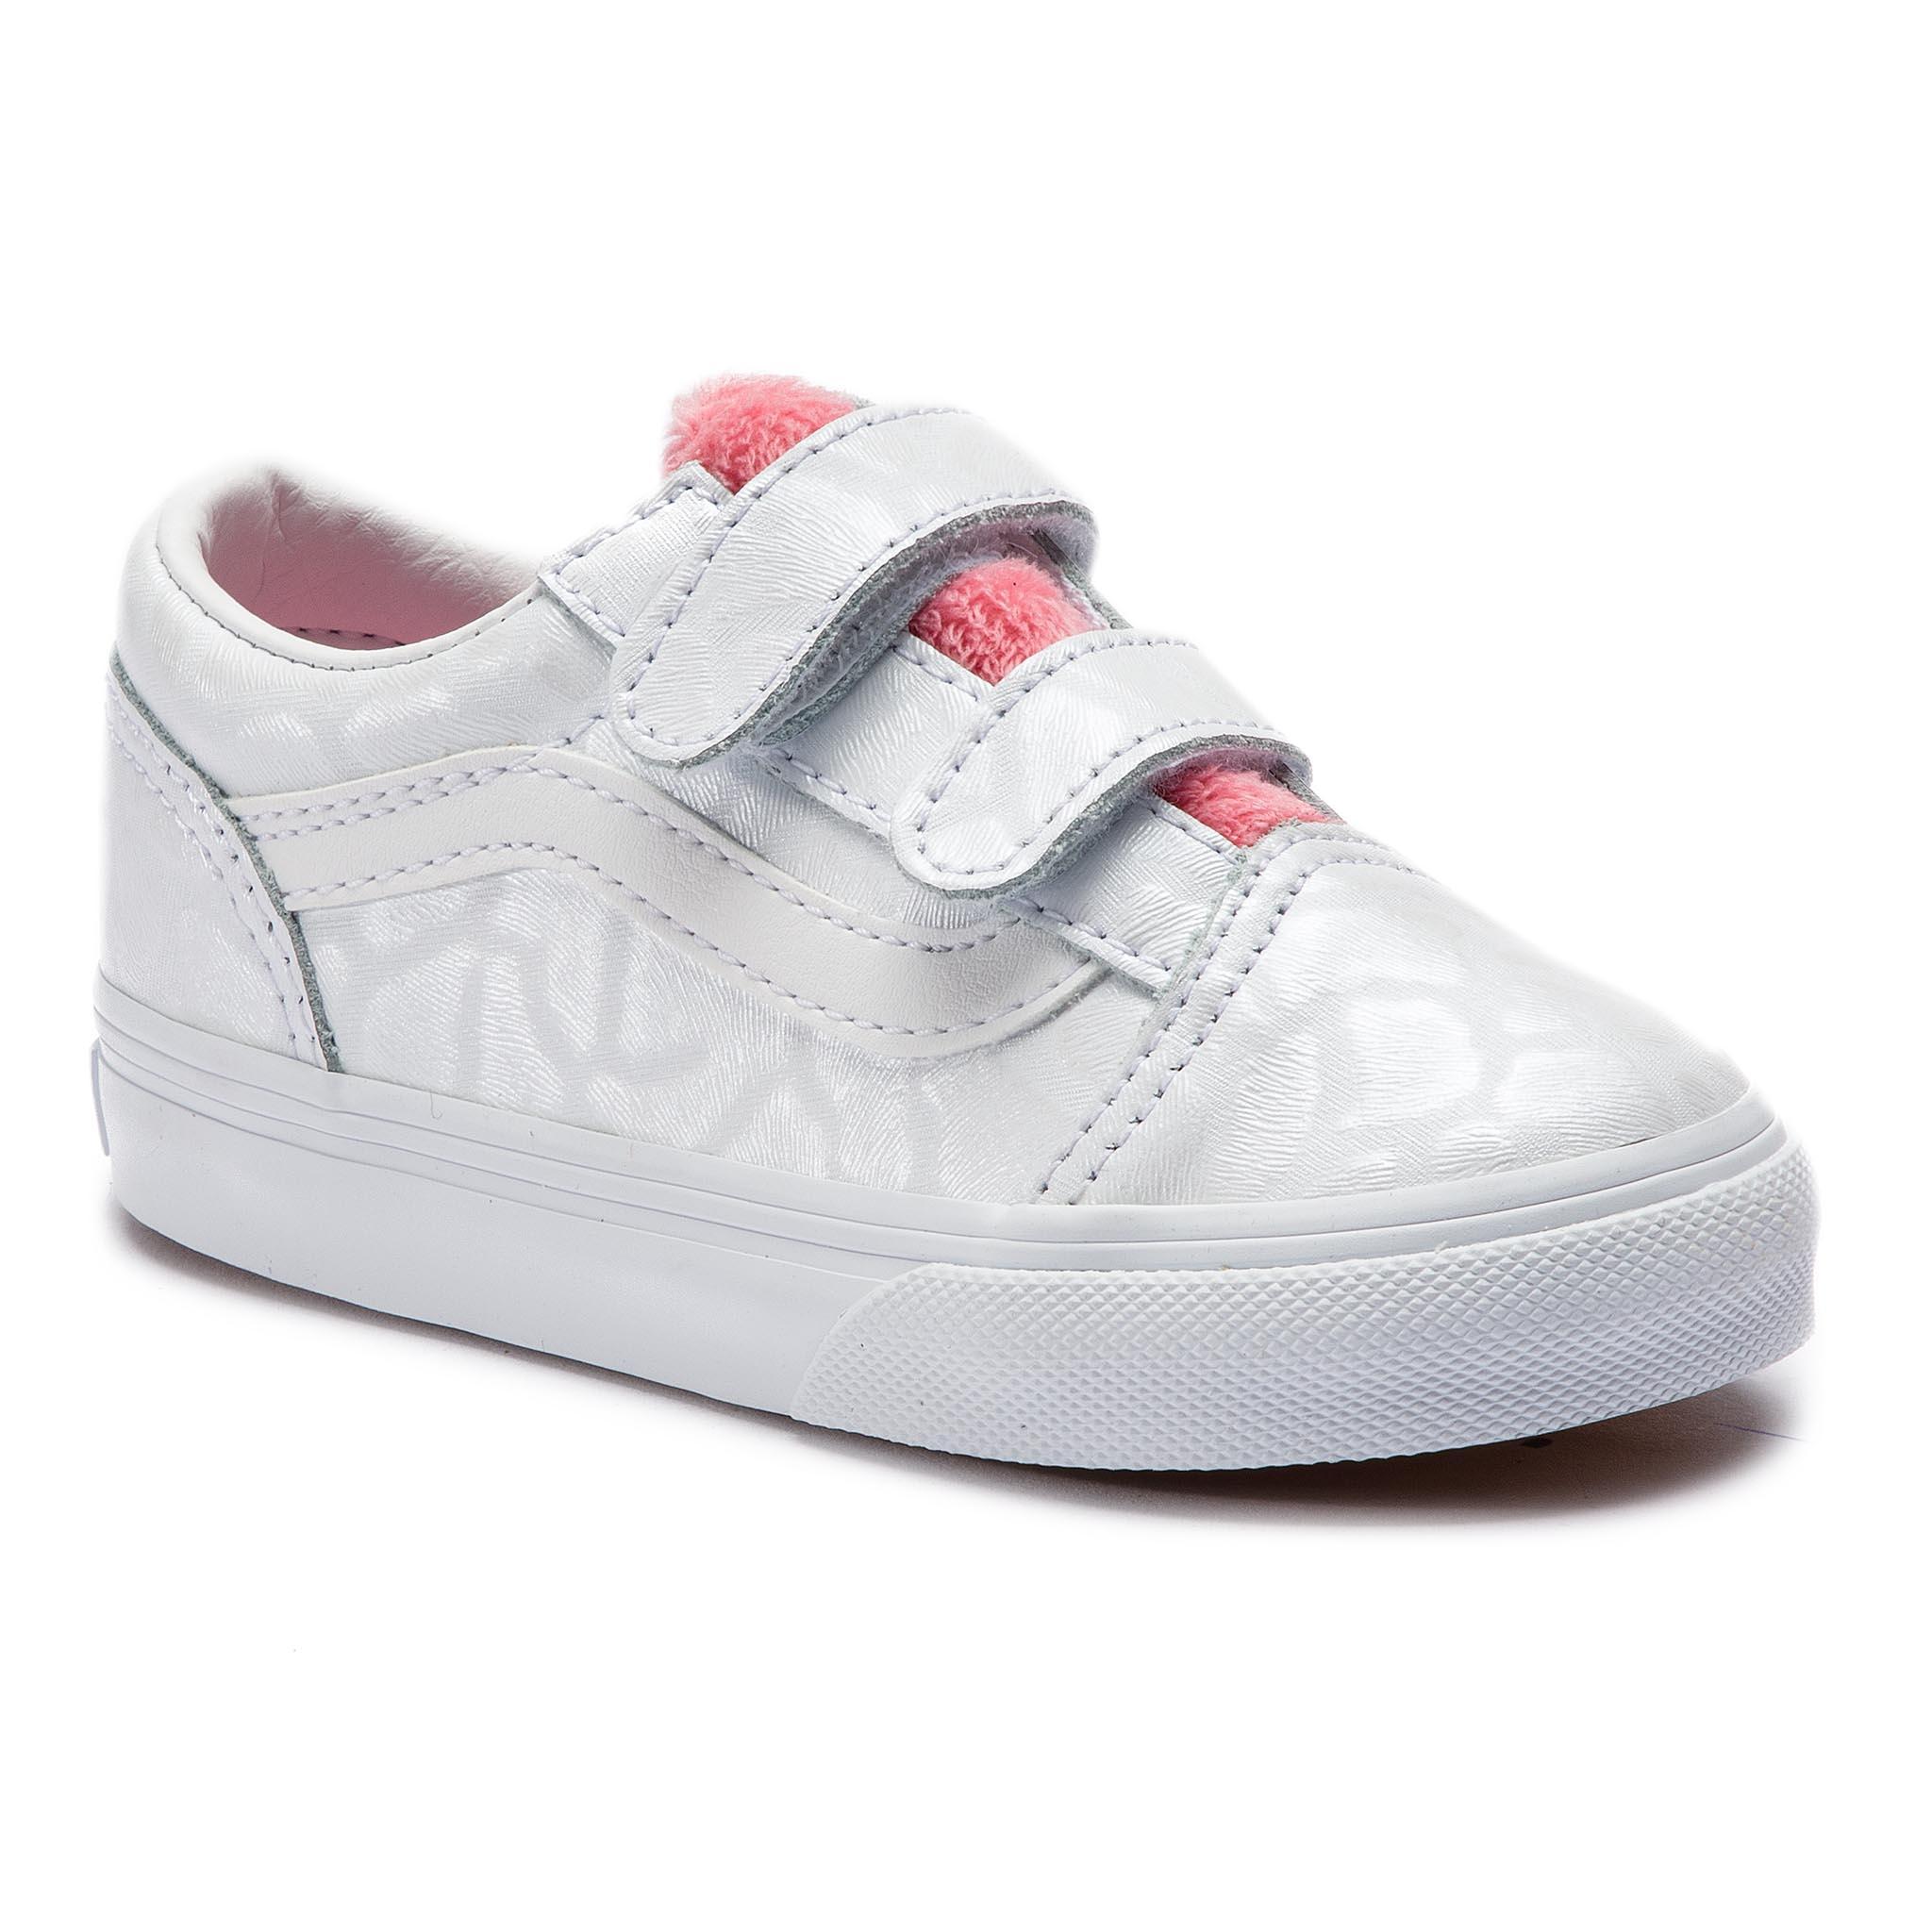 online store da1ee 60587 Shoes adidas - Duramo Lite 2.0 B75587 Ftwwht Greone Lgrani - Indoor ...